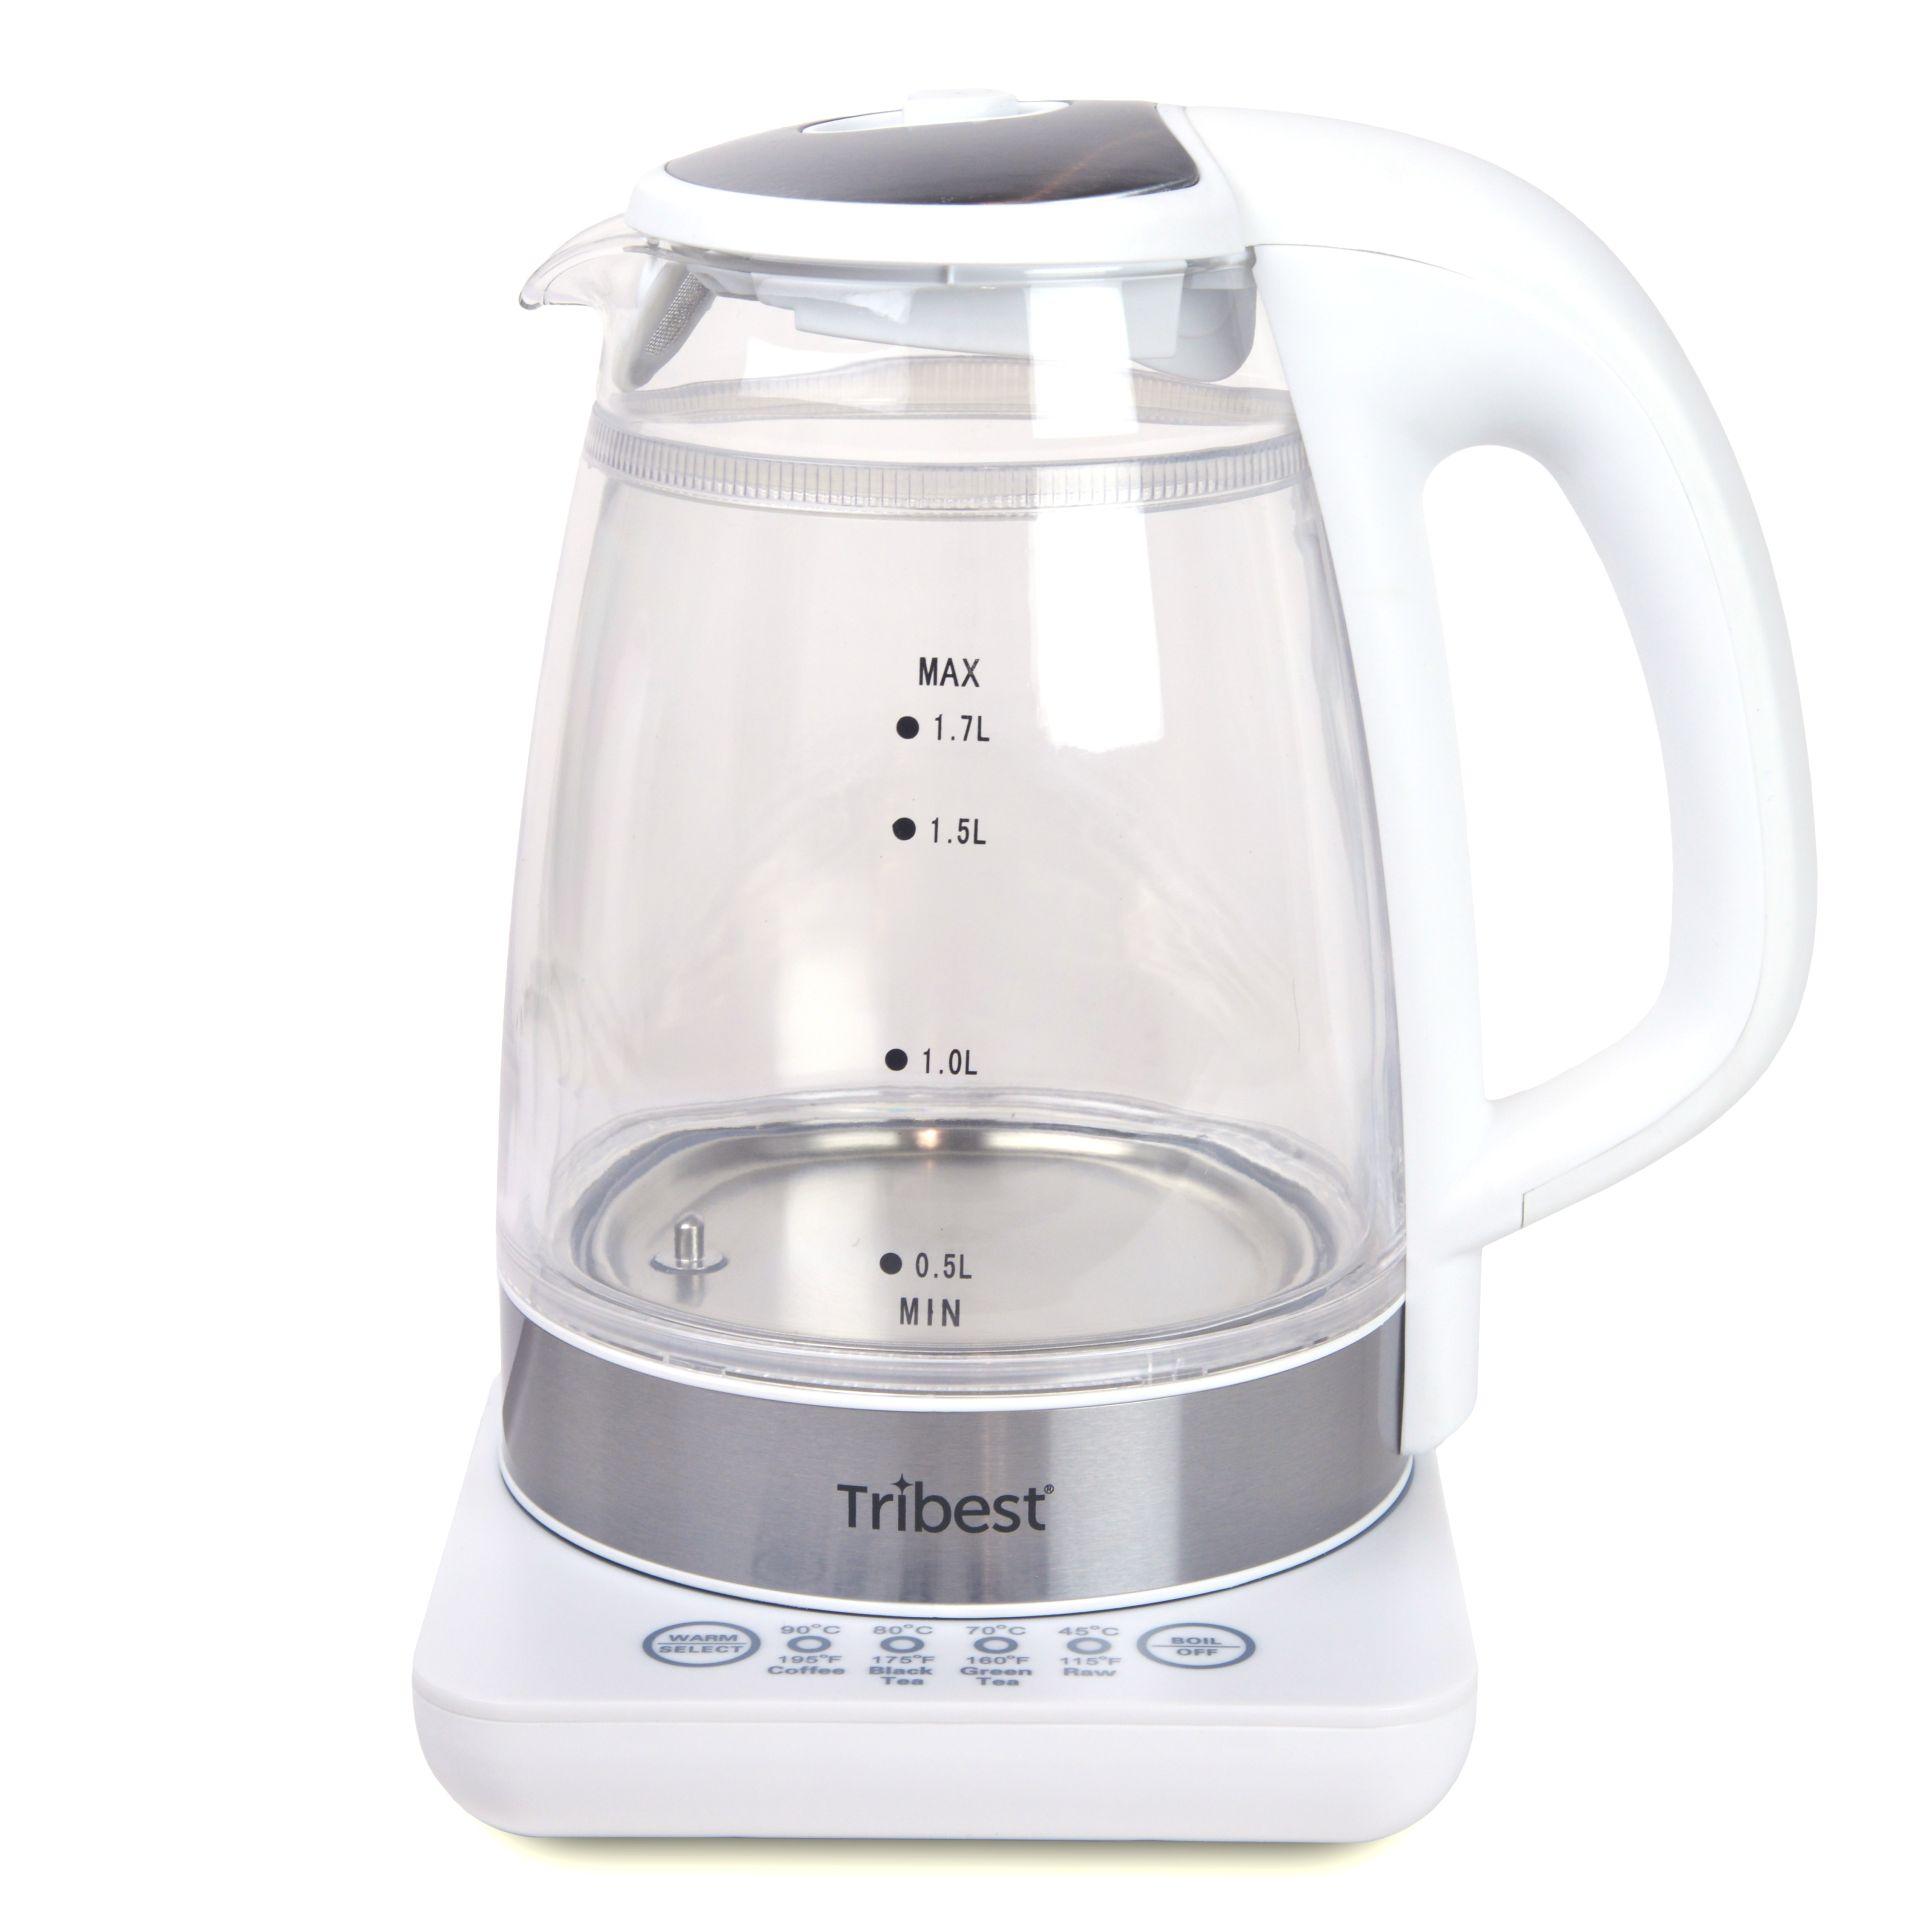 Tribest Wasserkocher GKD-450 Skala